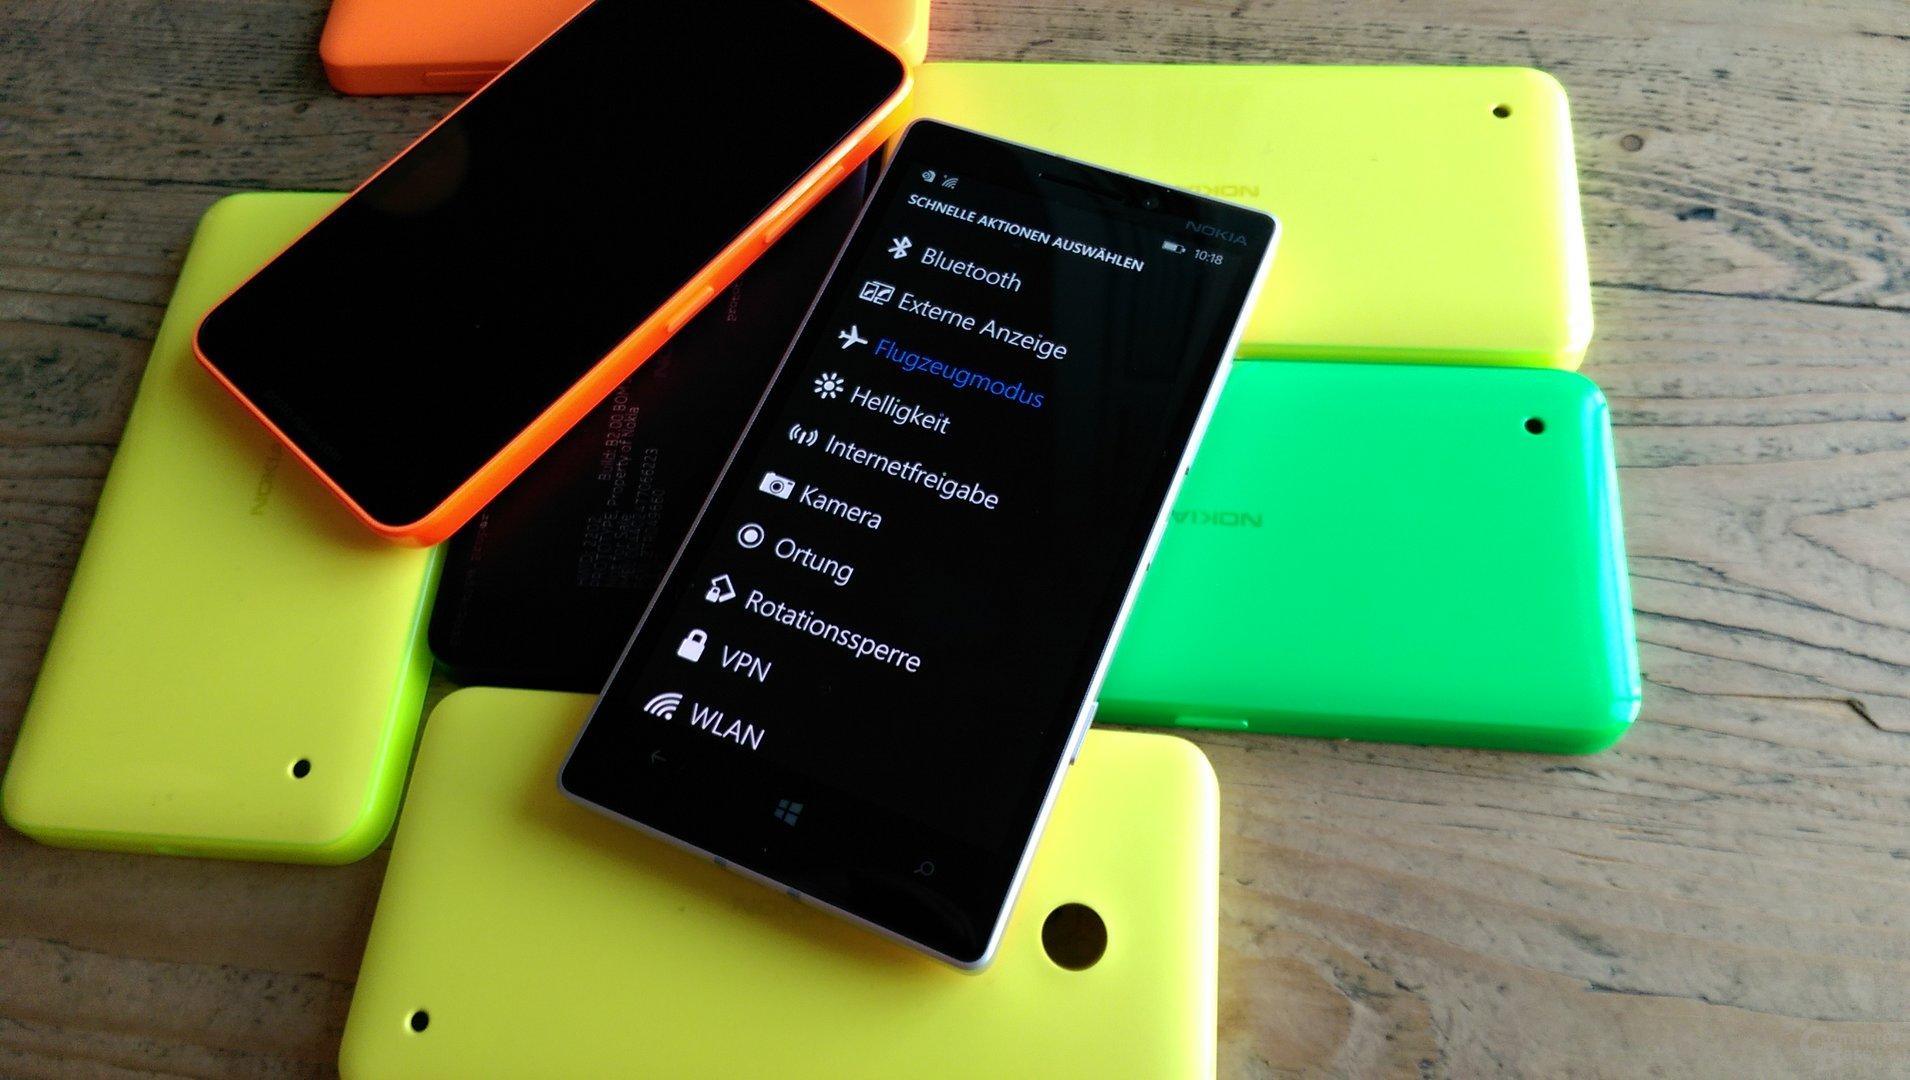 Enterprise-VPN unter Windows Phone 8.1